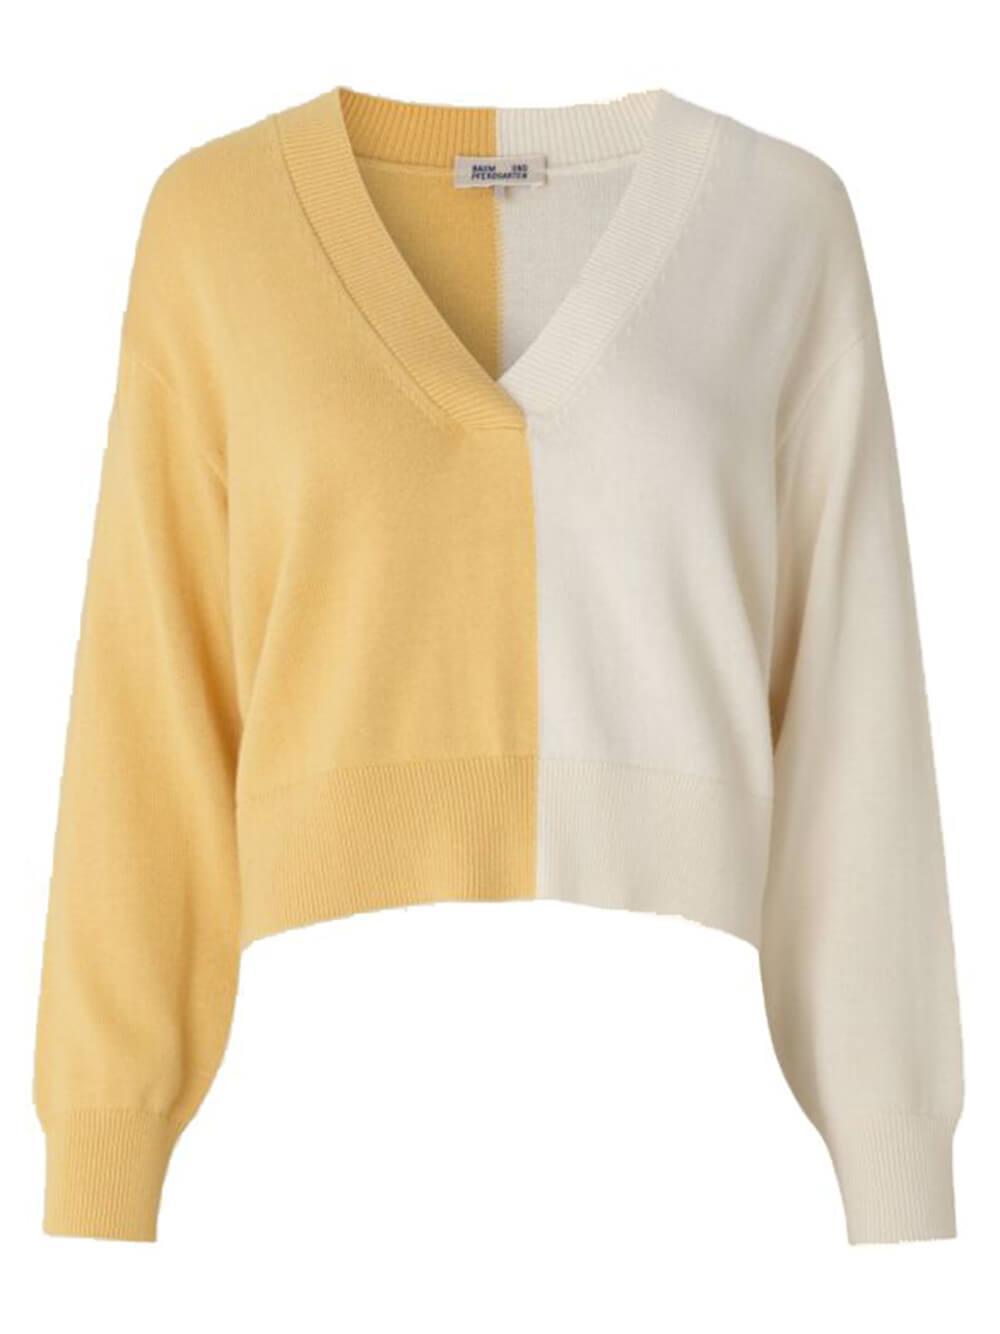 Coyra Colorblock Sweater